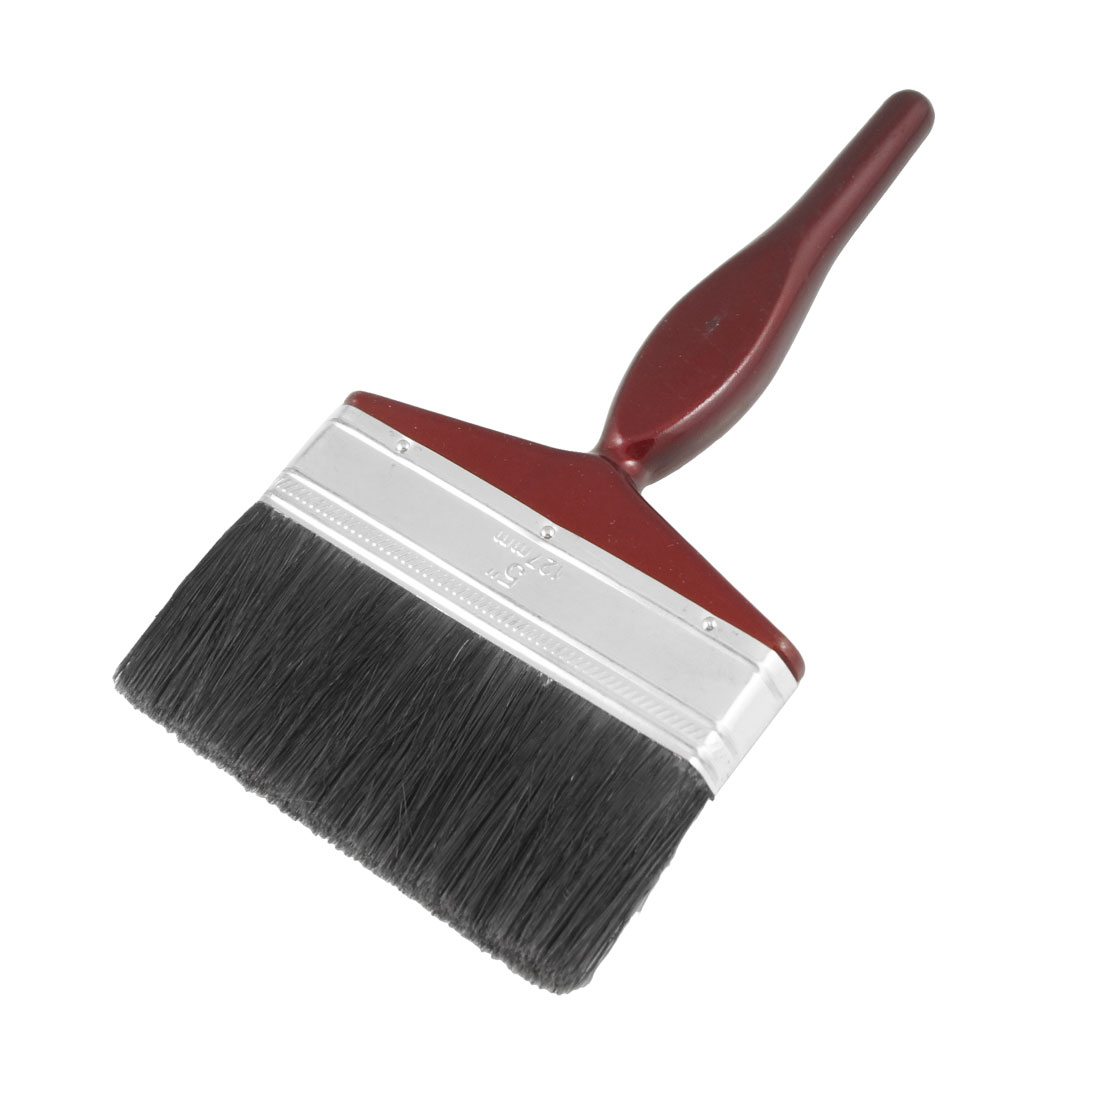 "5"" Wide Black Nylon Bristle Dark Red Handle Paint Brush Painting Tool"